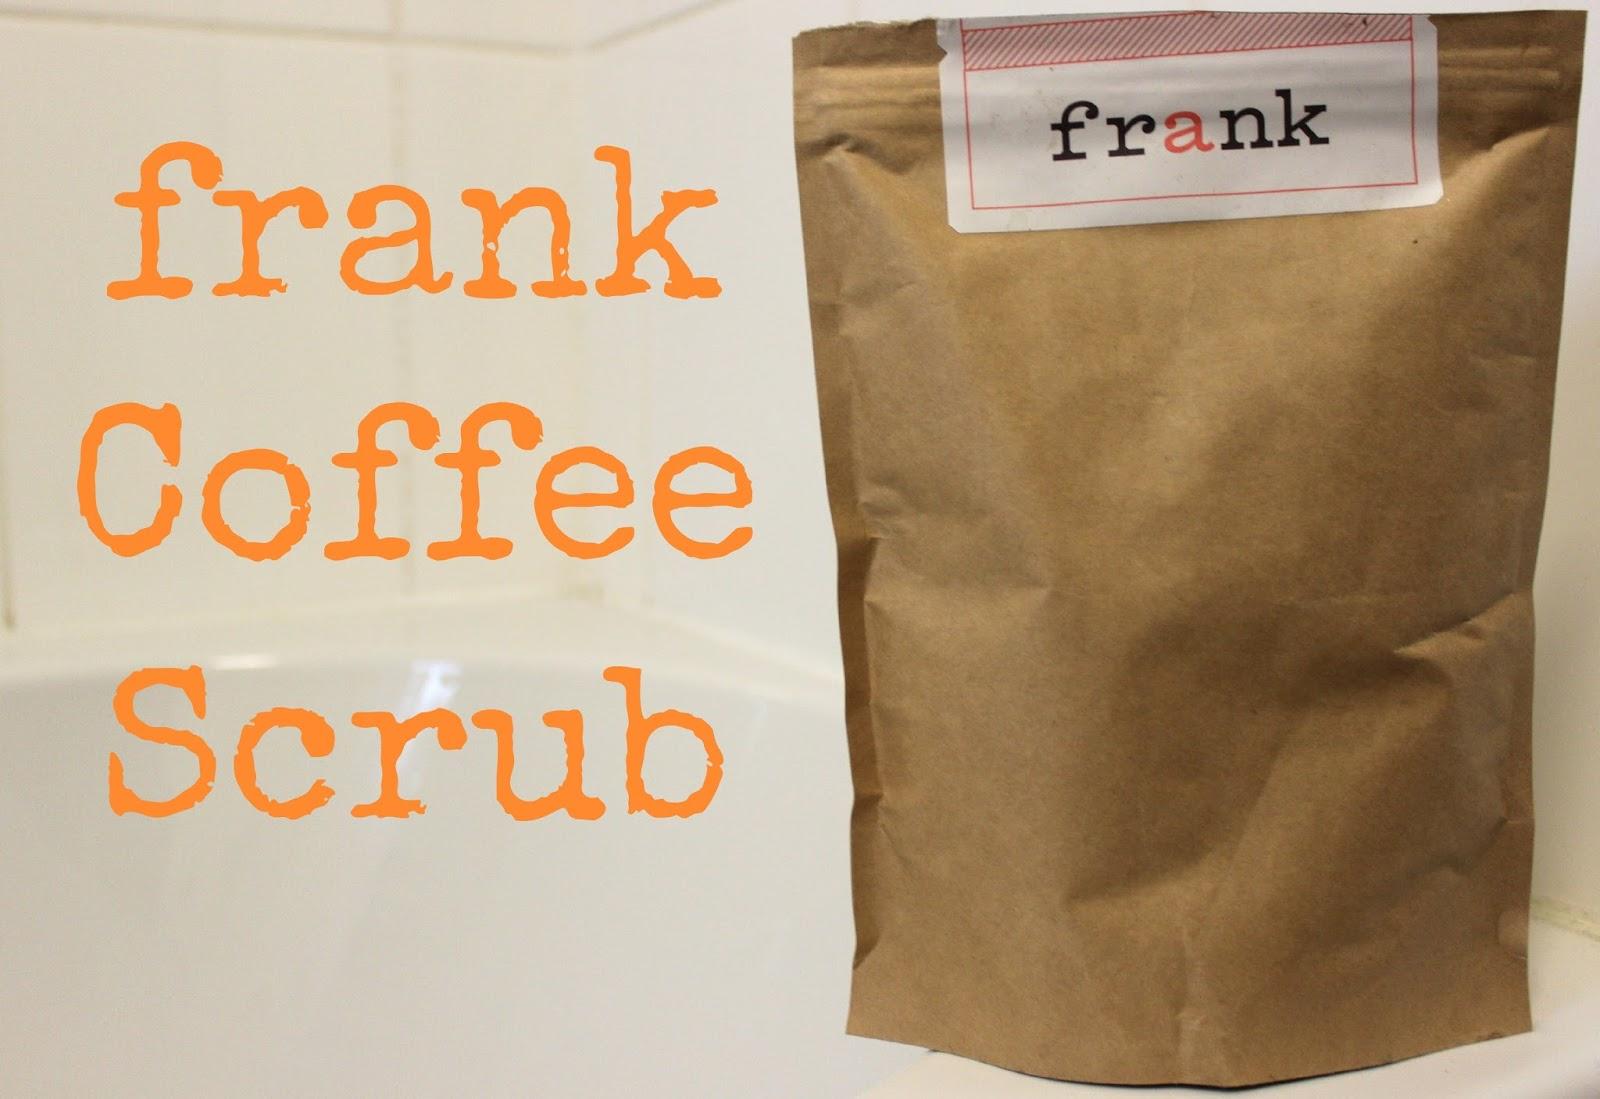 A picture of frank Original Coffee Scrub